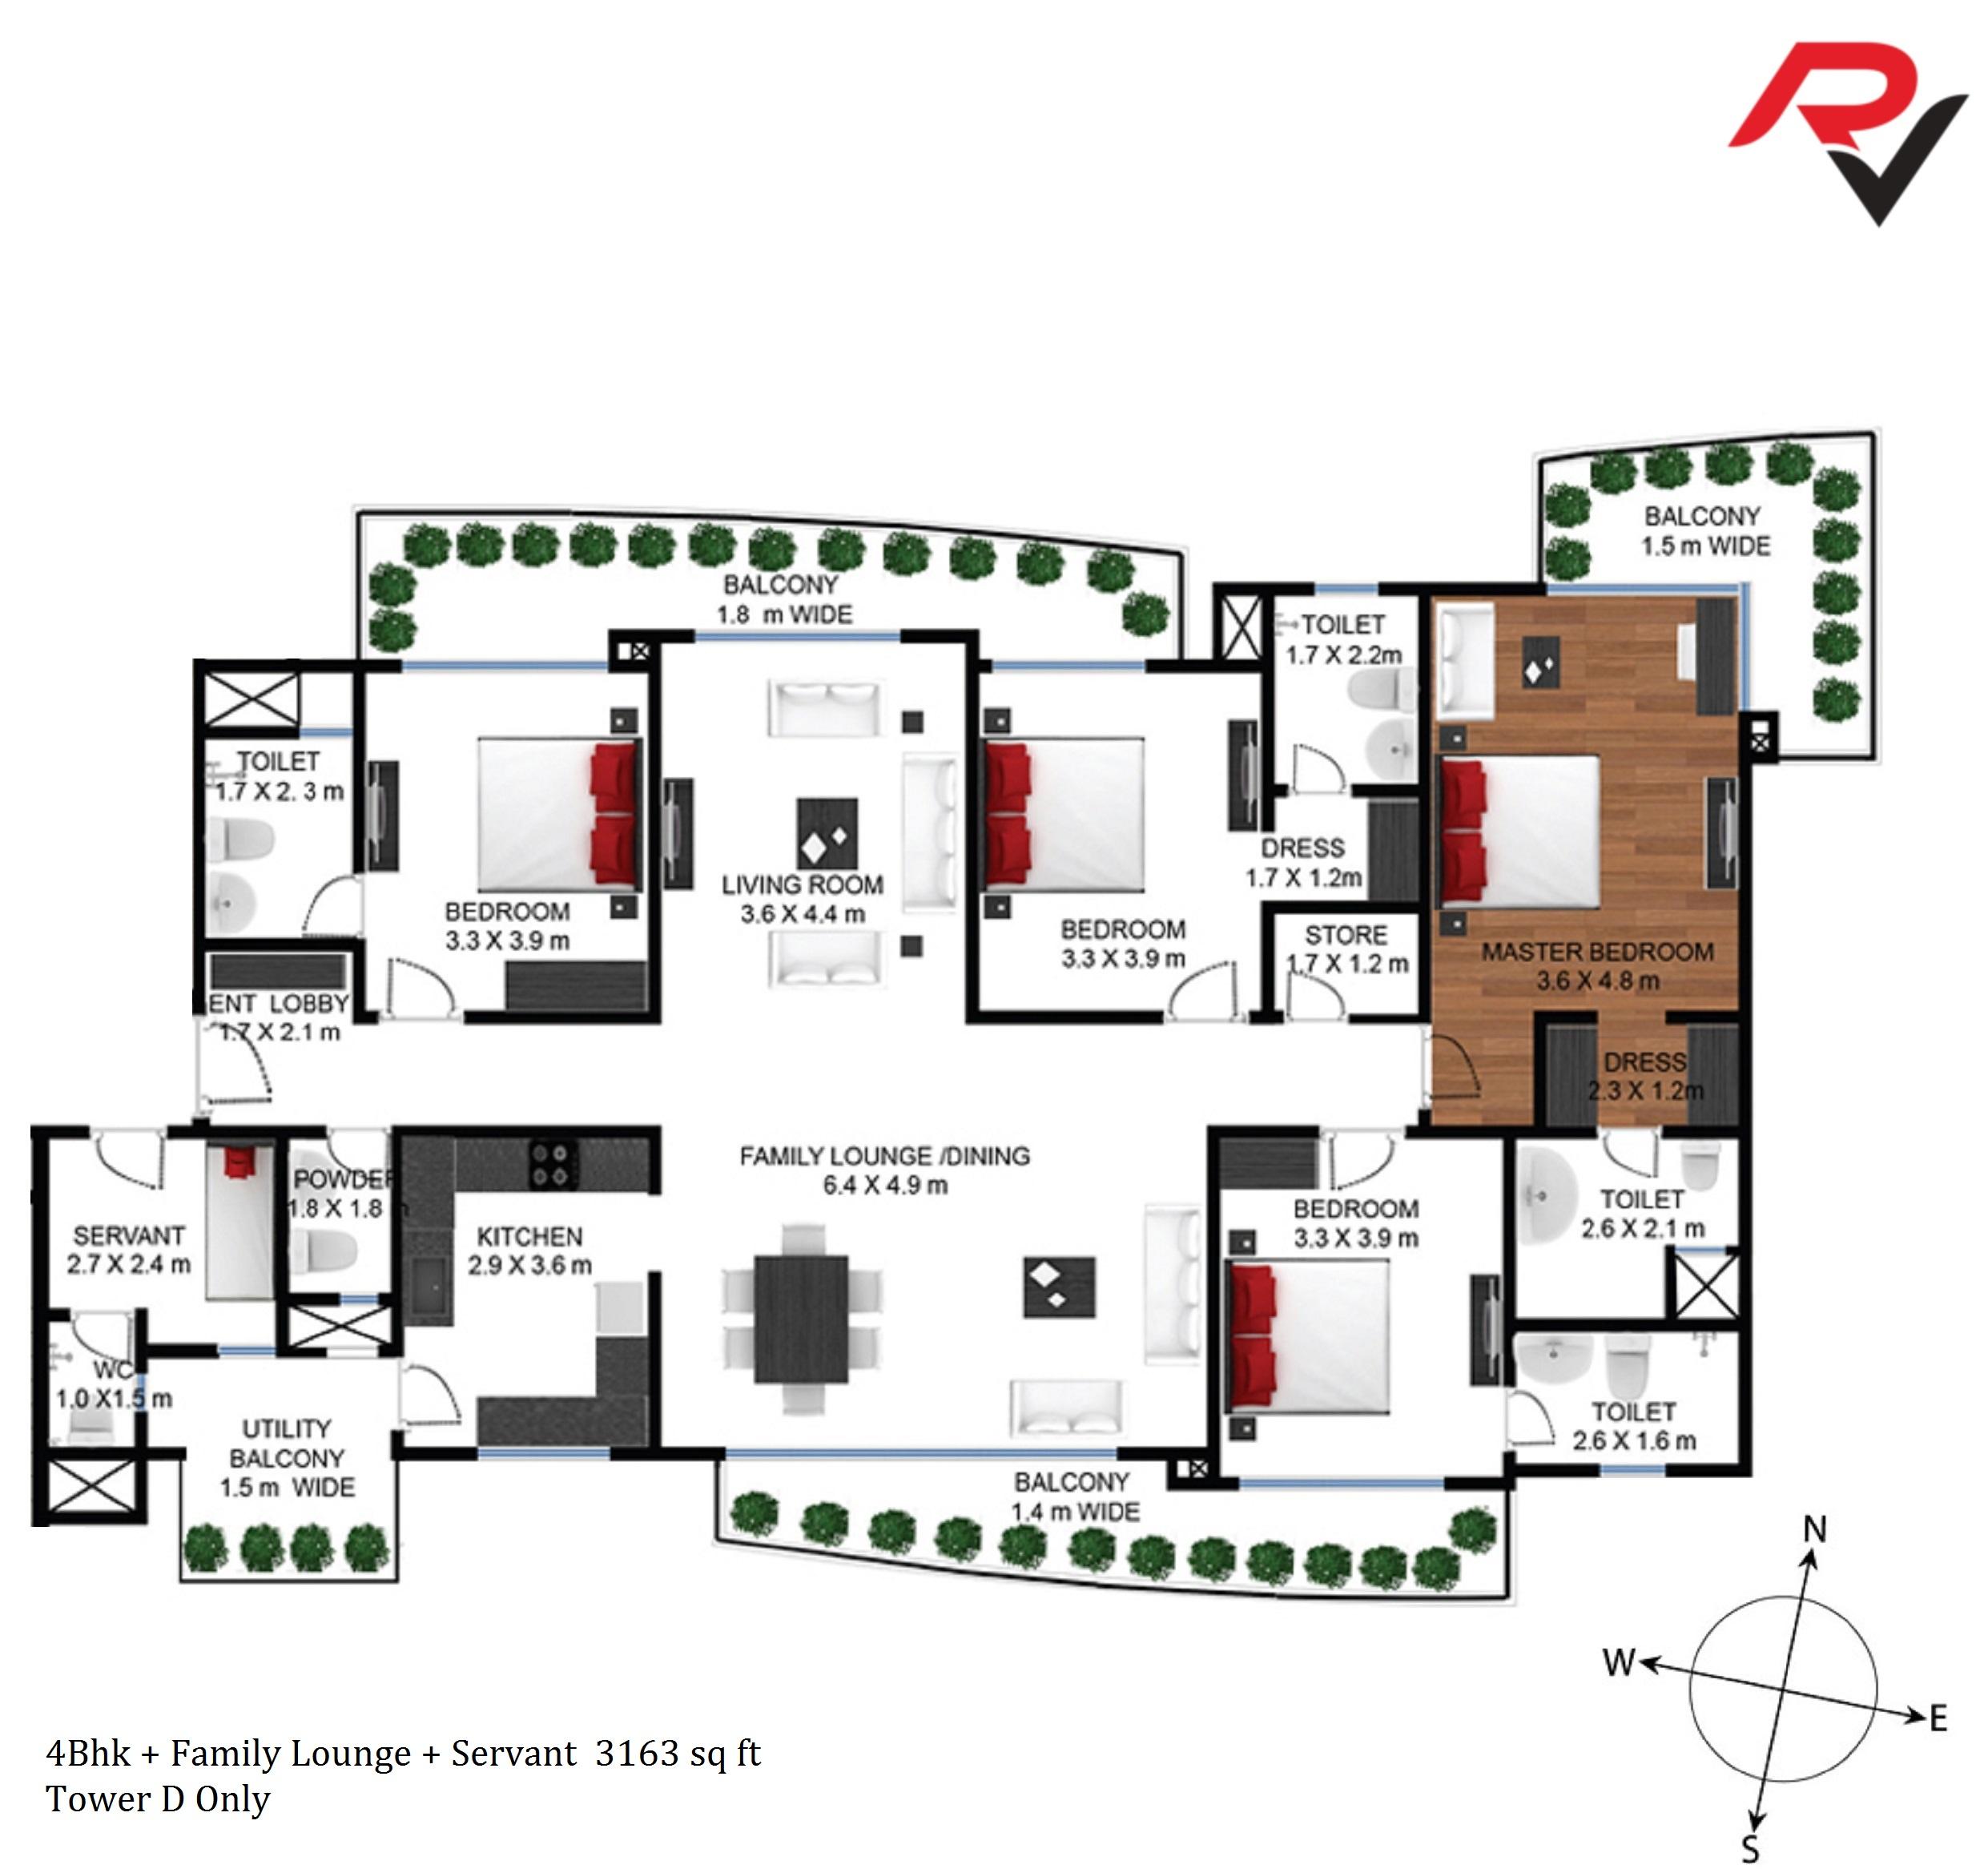 4Bhk + Family Lounge + Servant